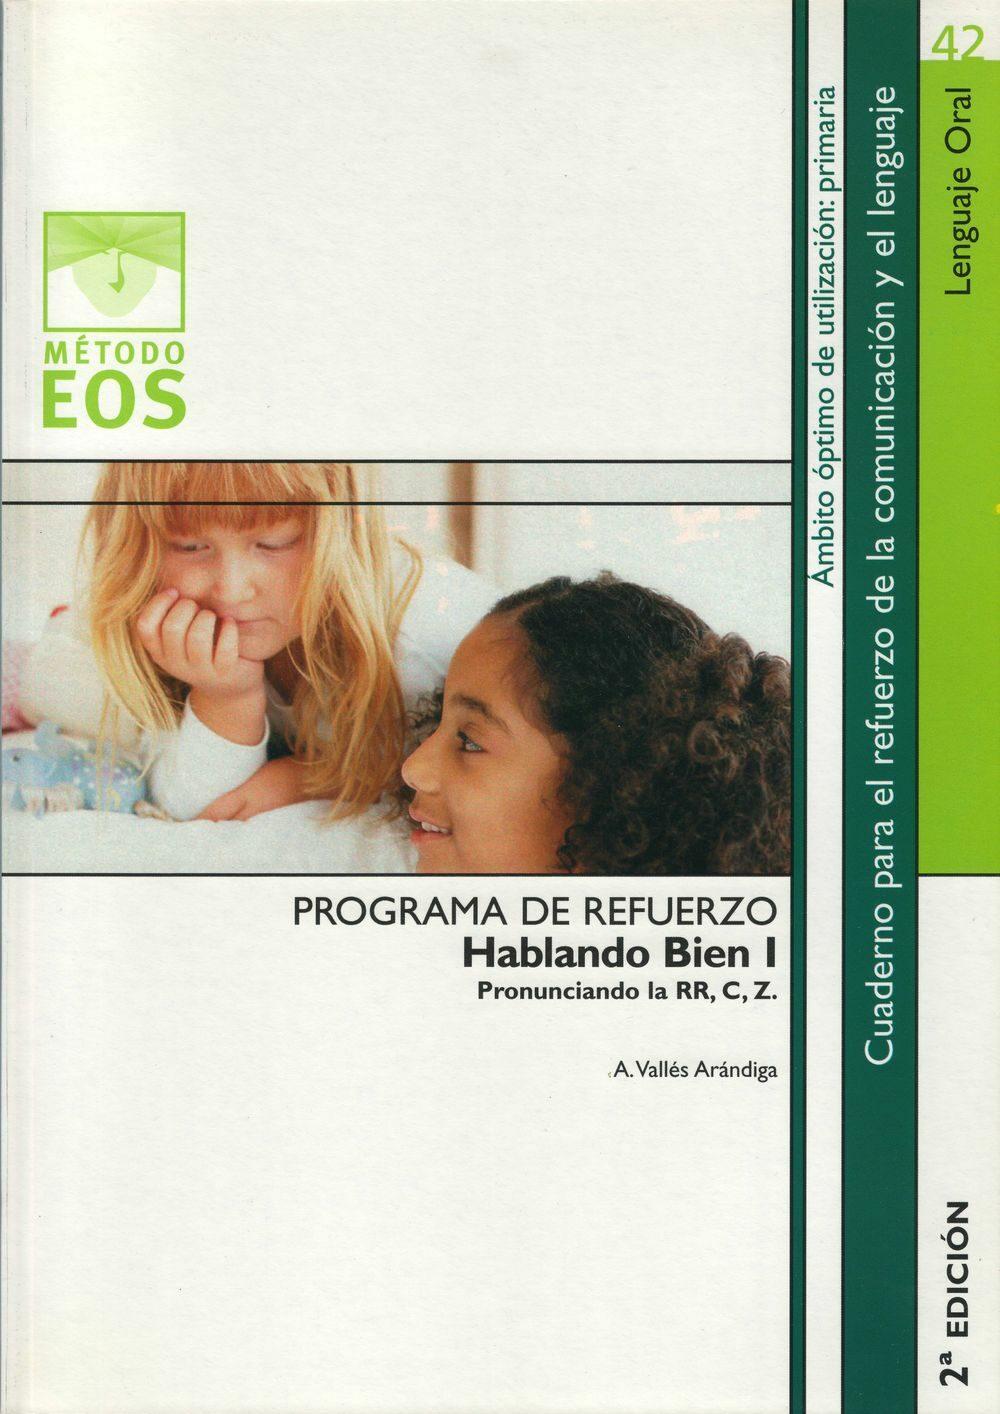 Programa De Refuerzo Hablando Bien I por A. Valles Arandiga